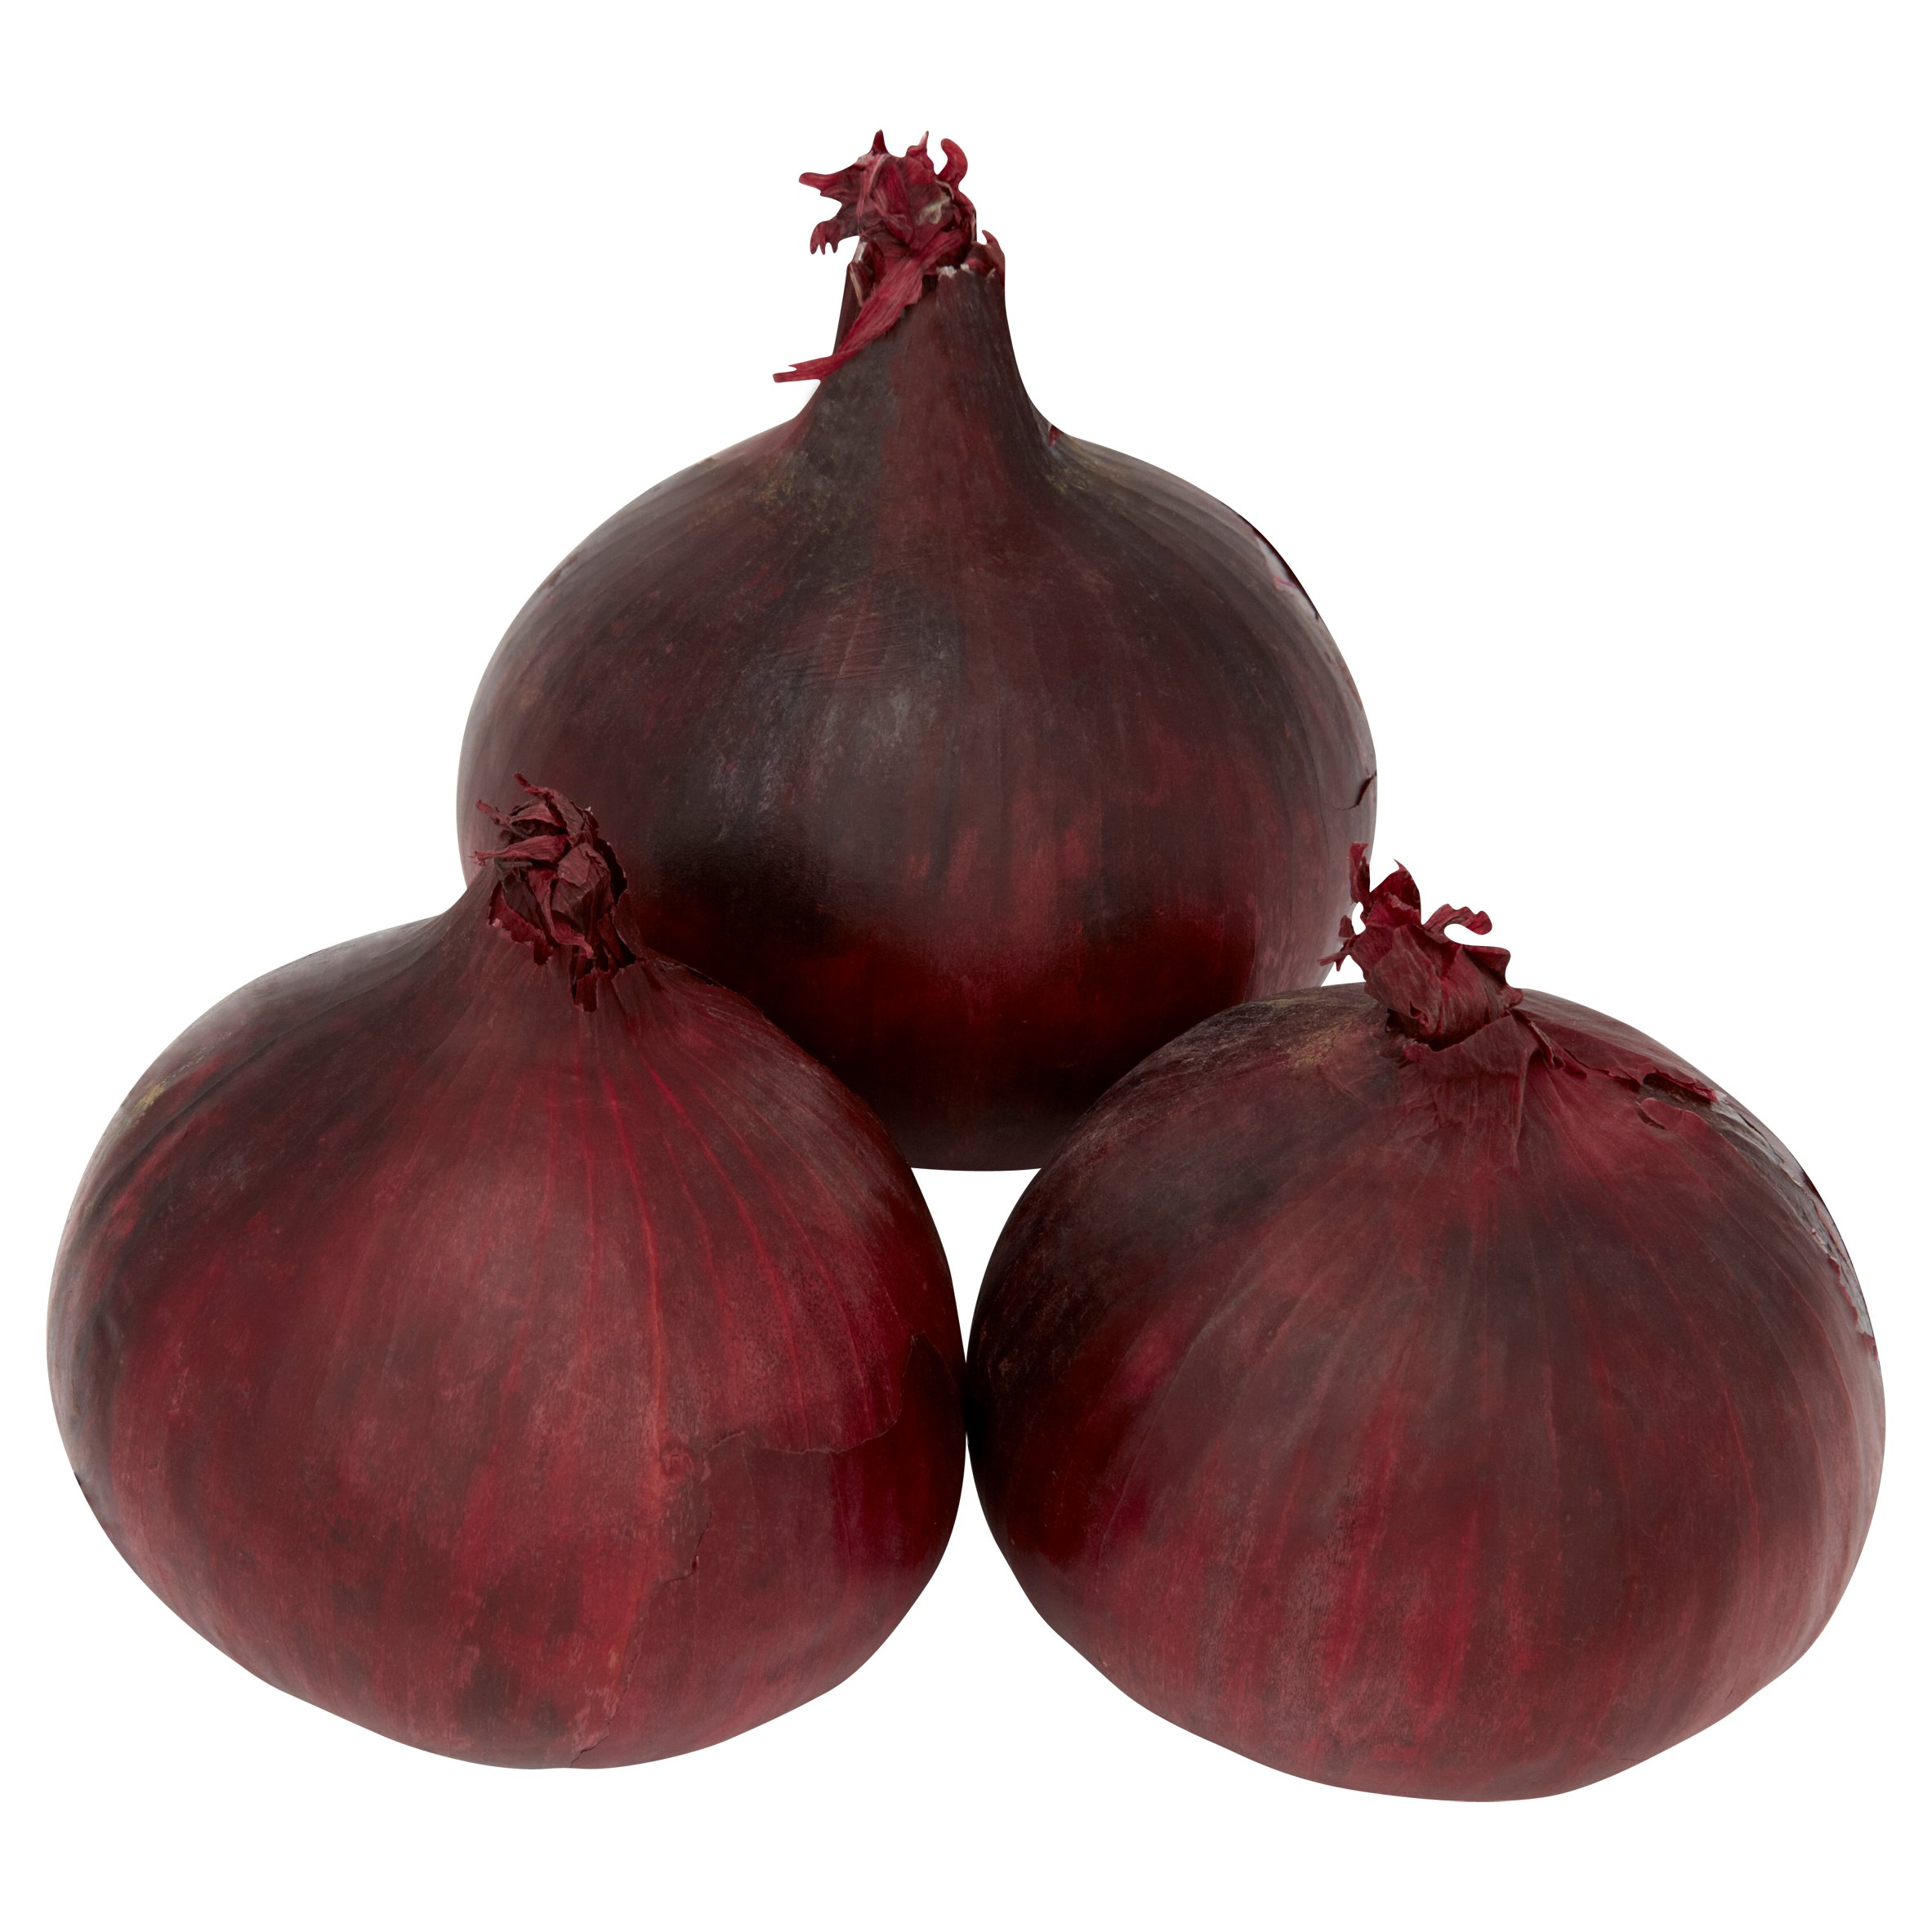 TESCO > Fresh Food > Loose Red Onions Class 2